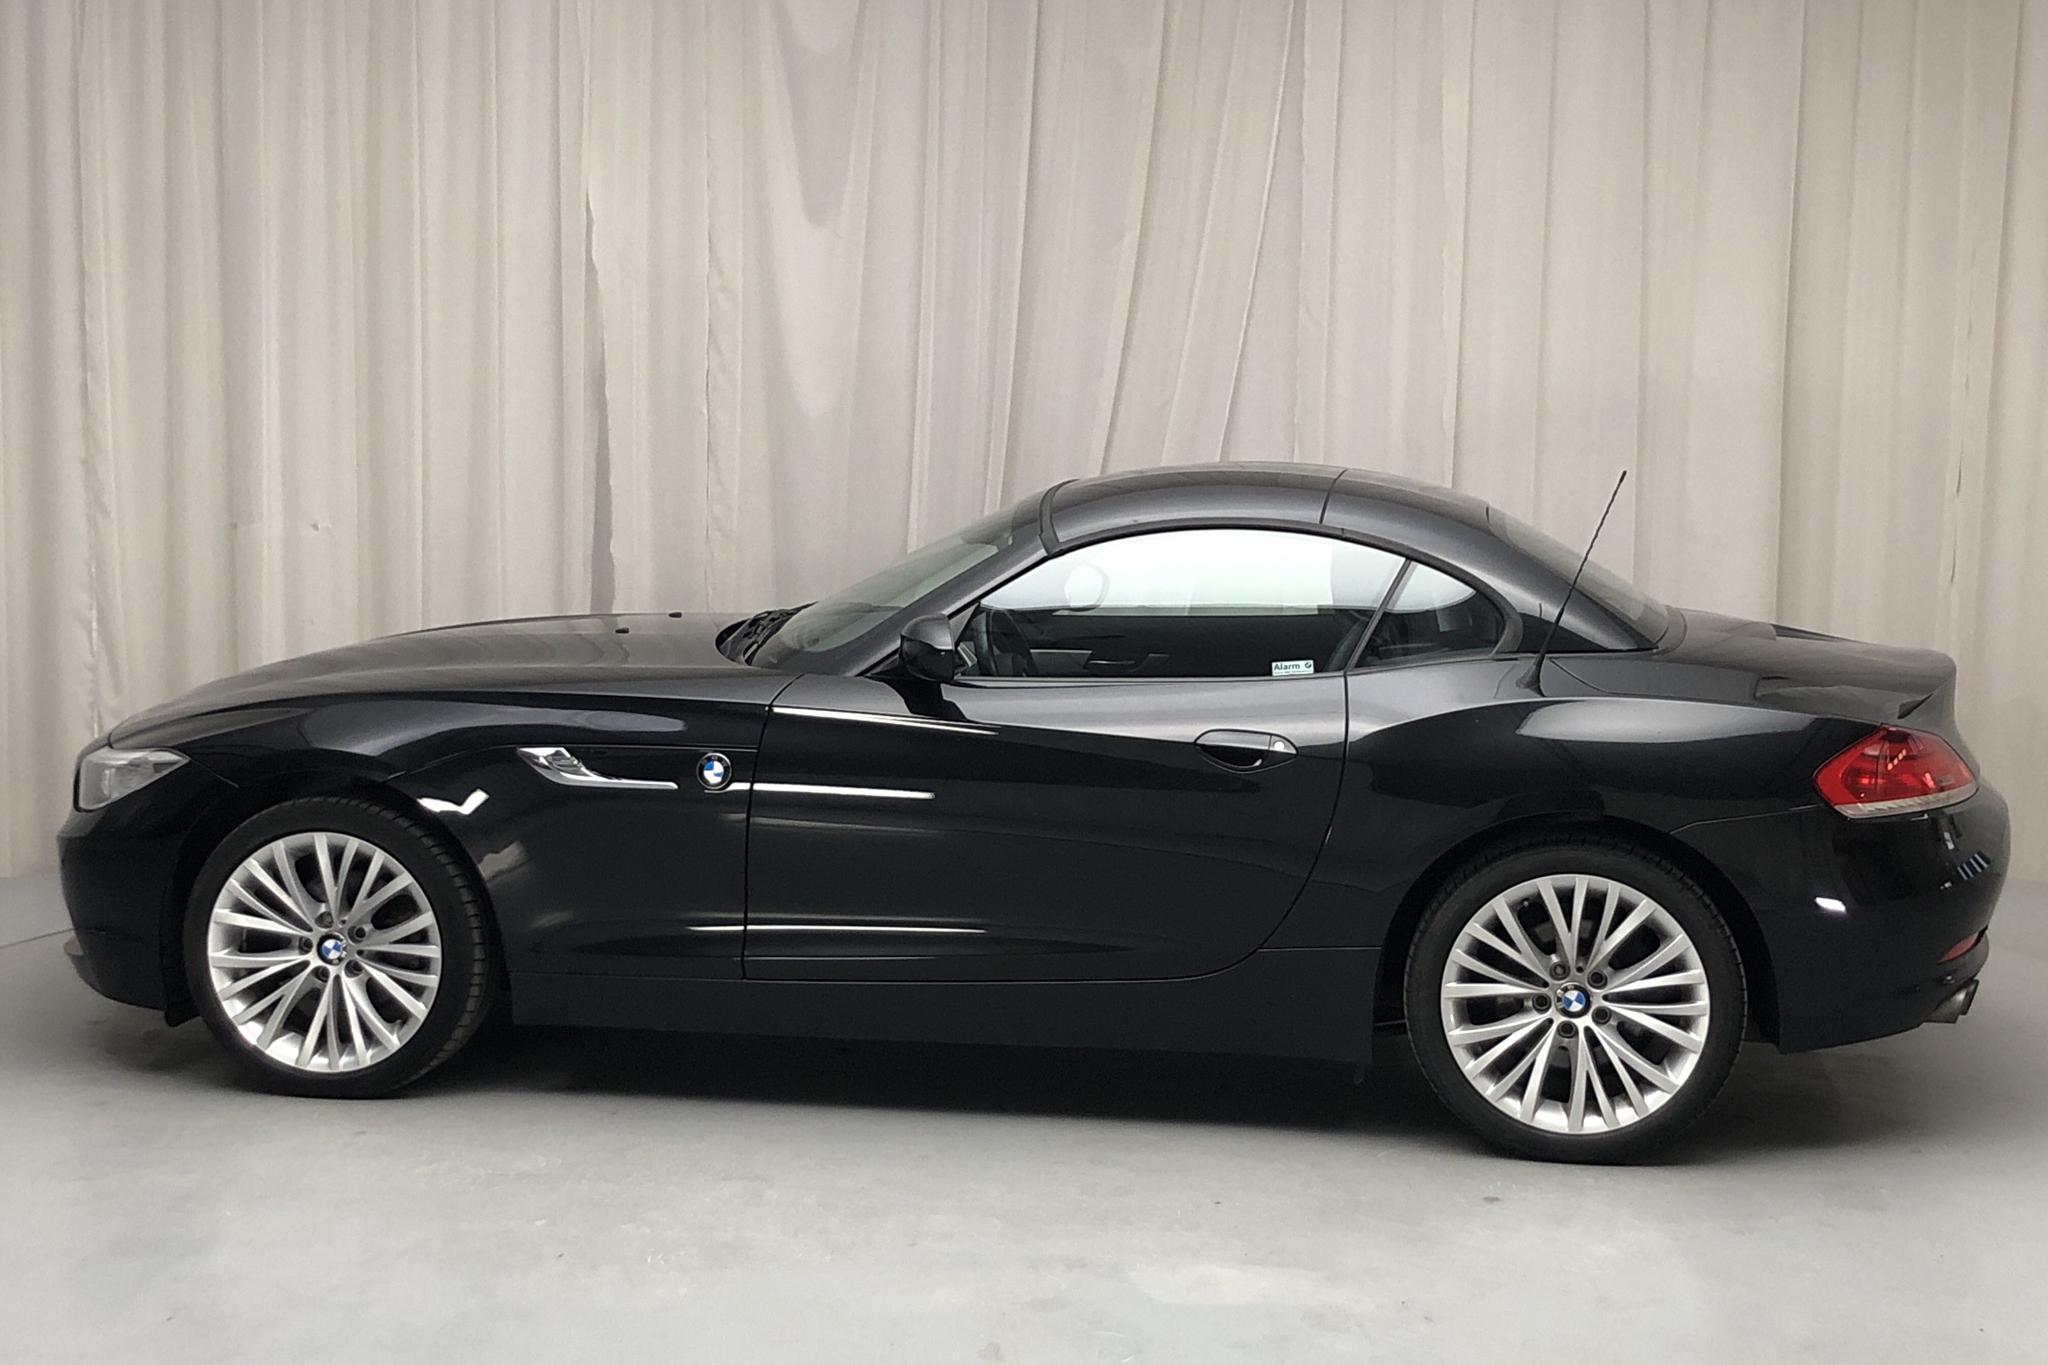 BMW Z4 sDrive 18i Roadster, E89 (156hk) - 6 297 mil - Manuell - svart - 2013